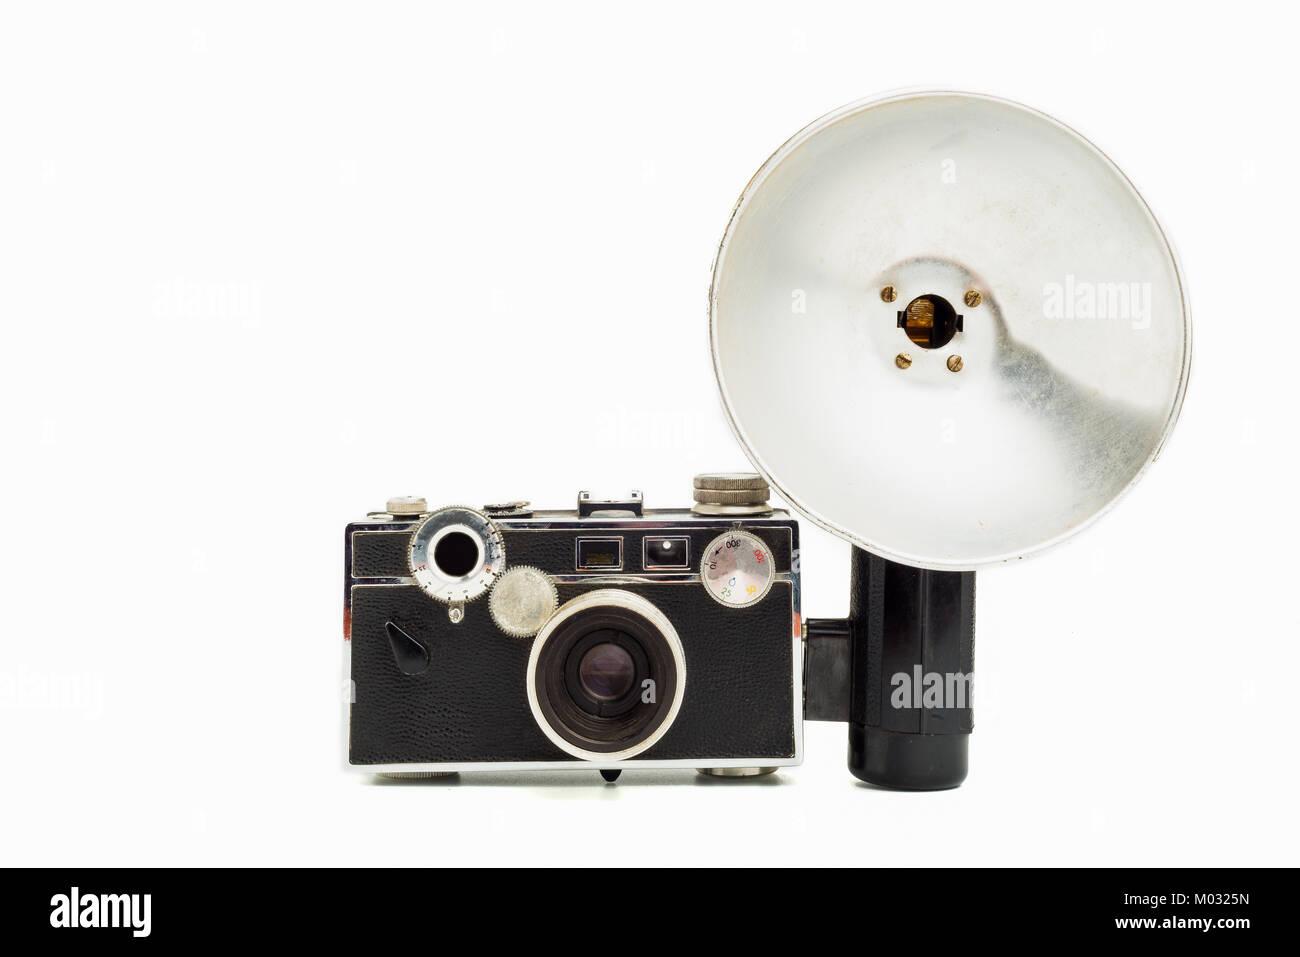 Old 35mm film camera wit flash on white background - Stock Image